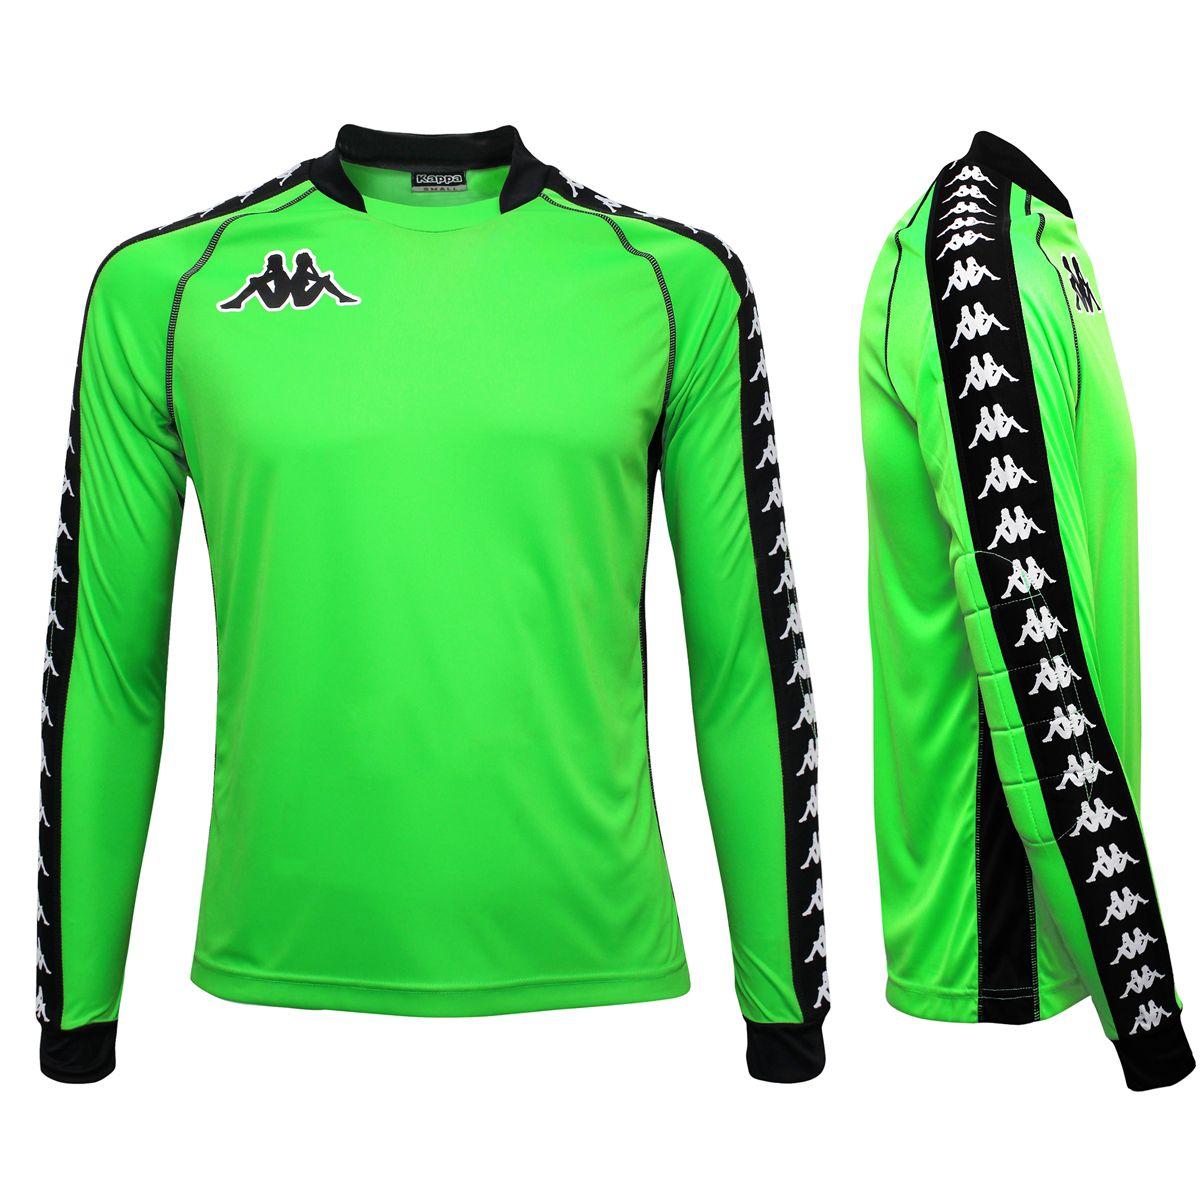 Kappa T-shirt sportiva KAPPA4SOCCER GK1 Bambino Calcio sport Camicia